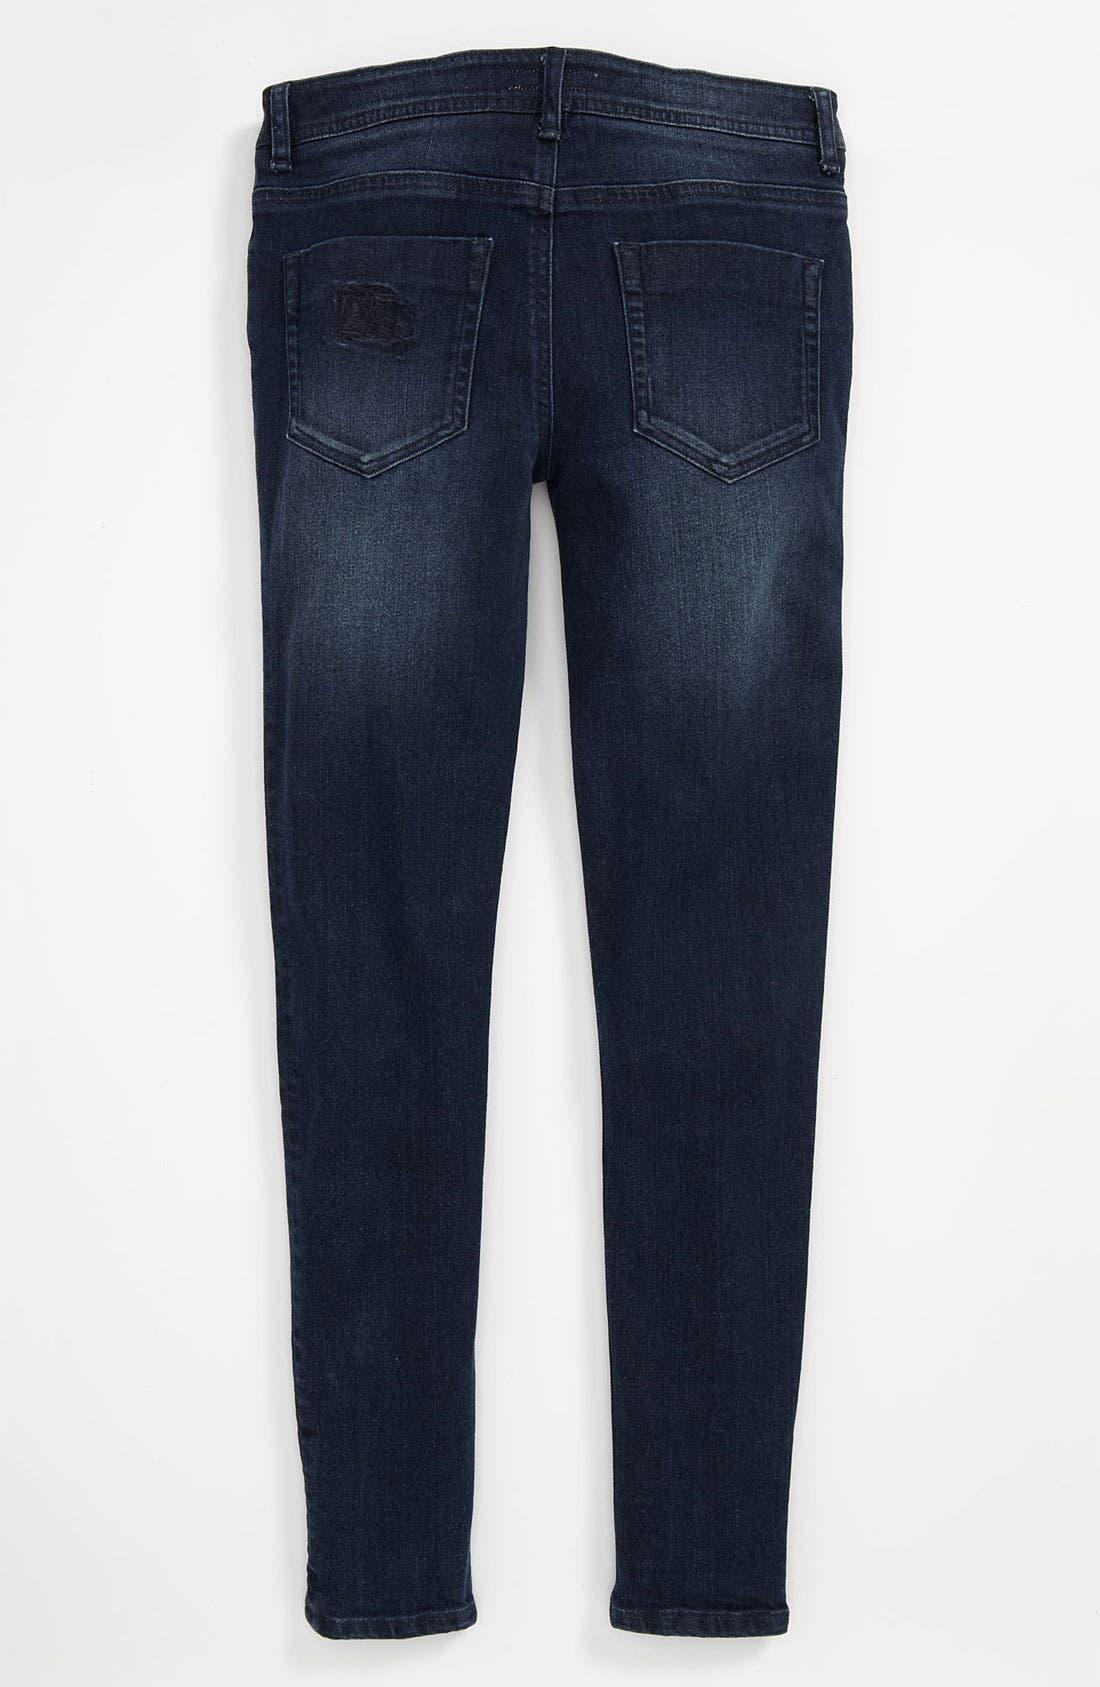 Main Image - Burberry 'Mini Langley' Skinny Jeans (Little Girls & Big Girls)